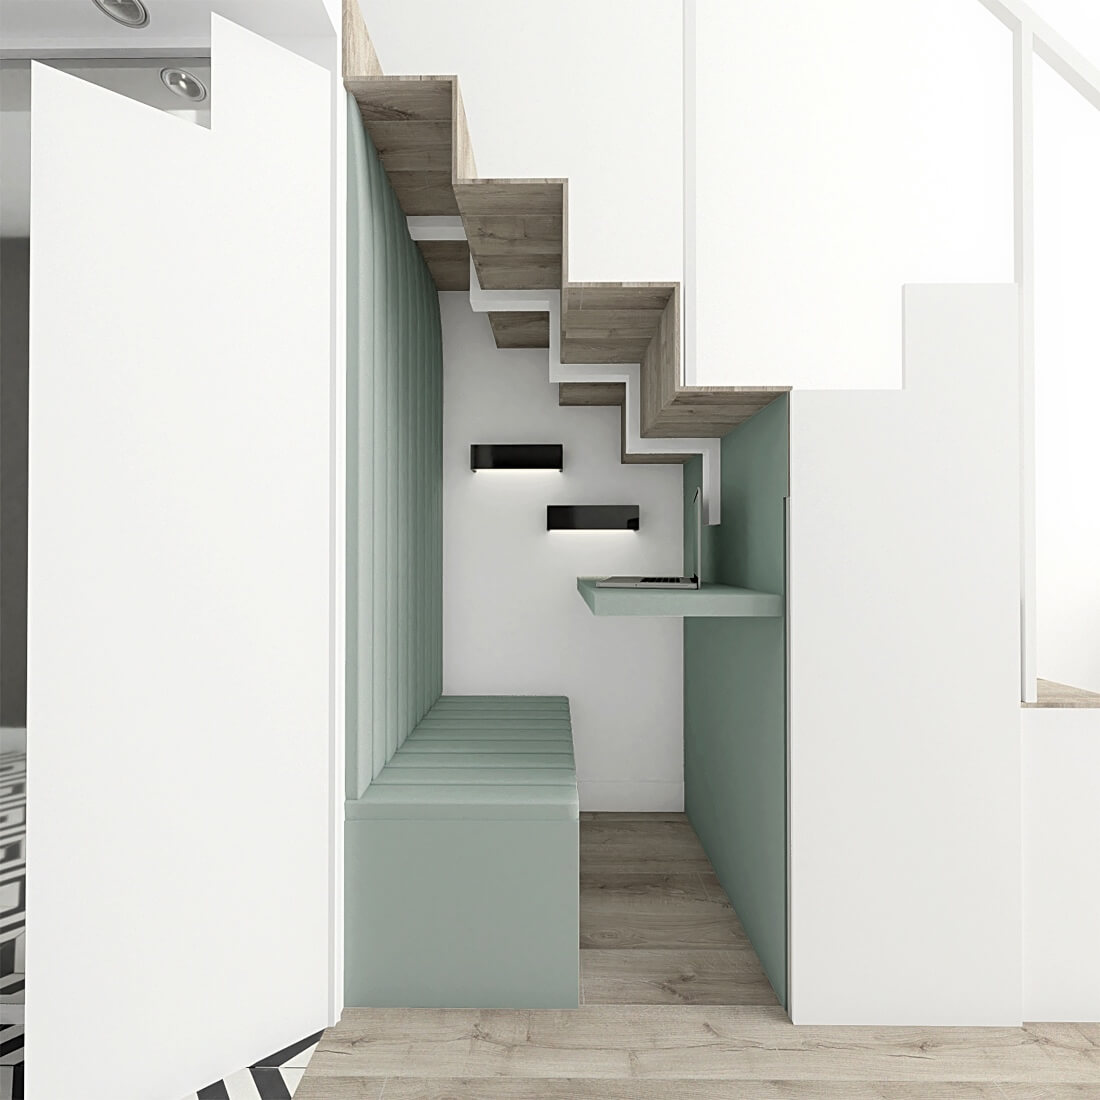 Biuro ukryte pod schodami